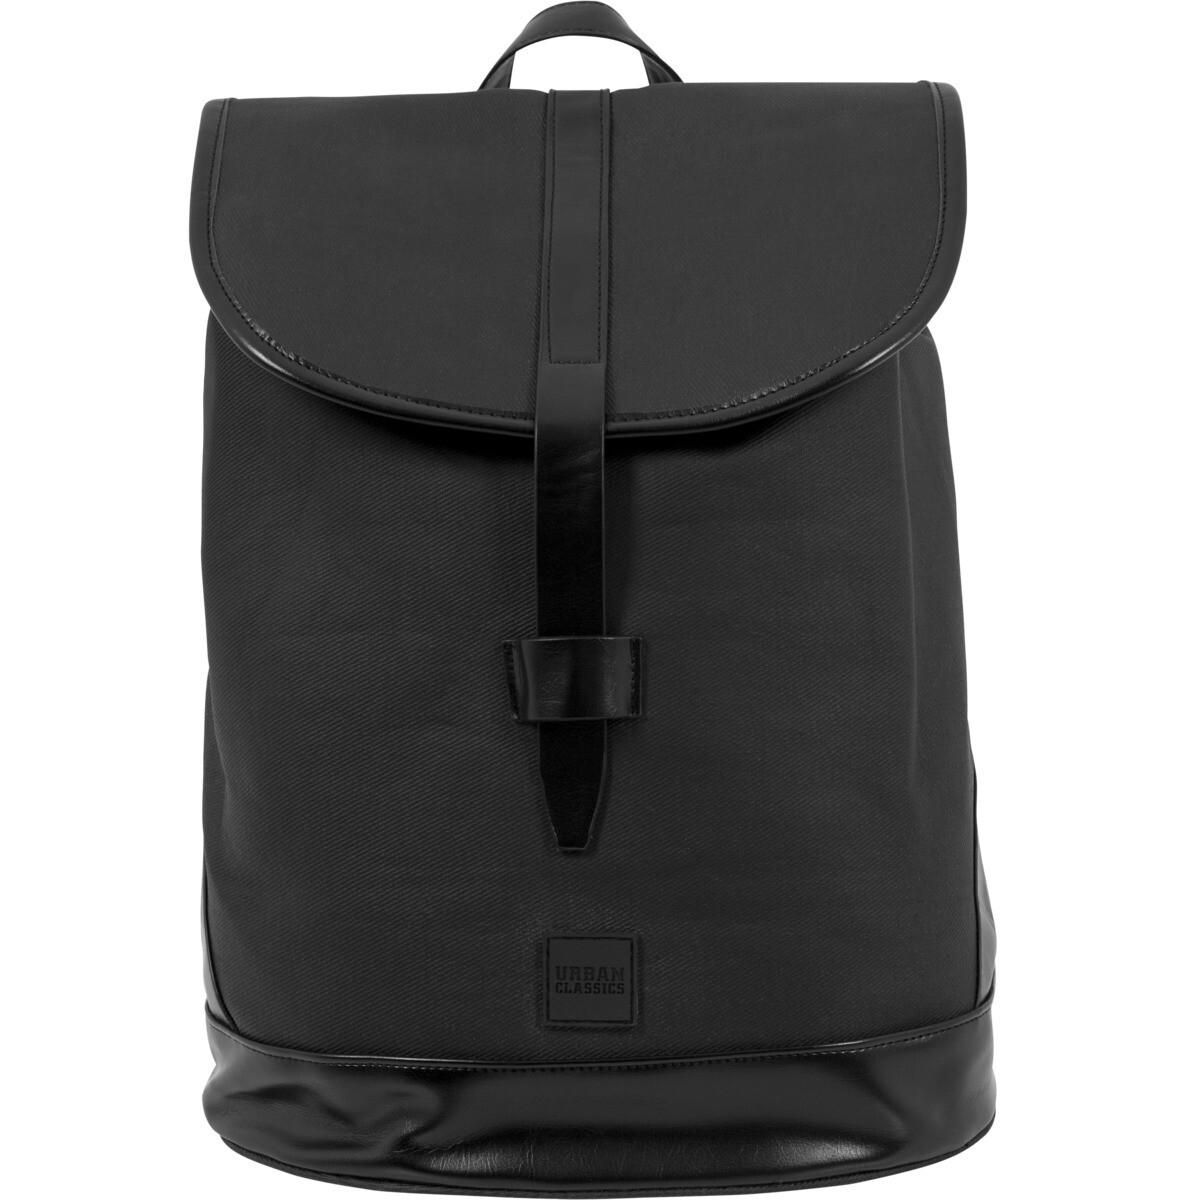 Topcover Backpack - Schwarz